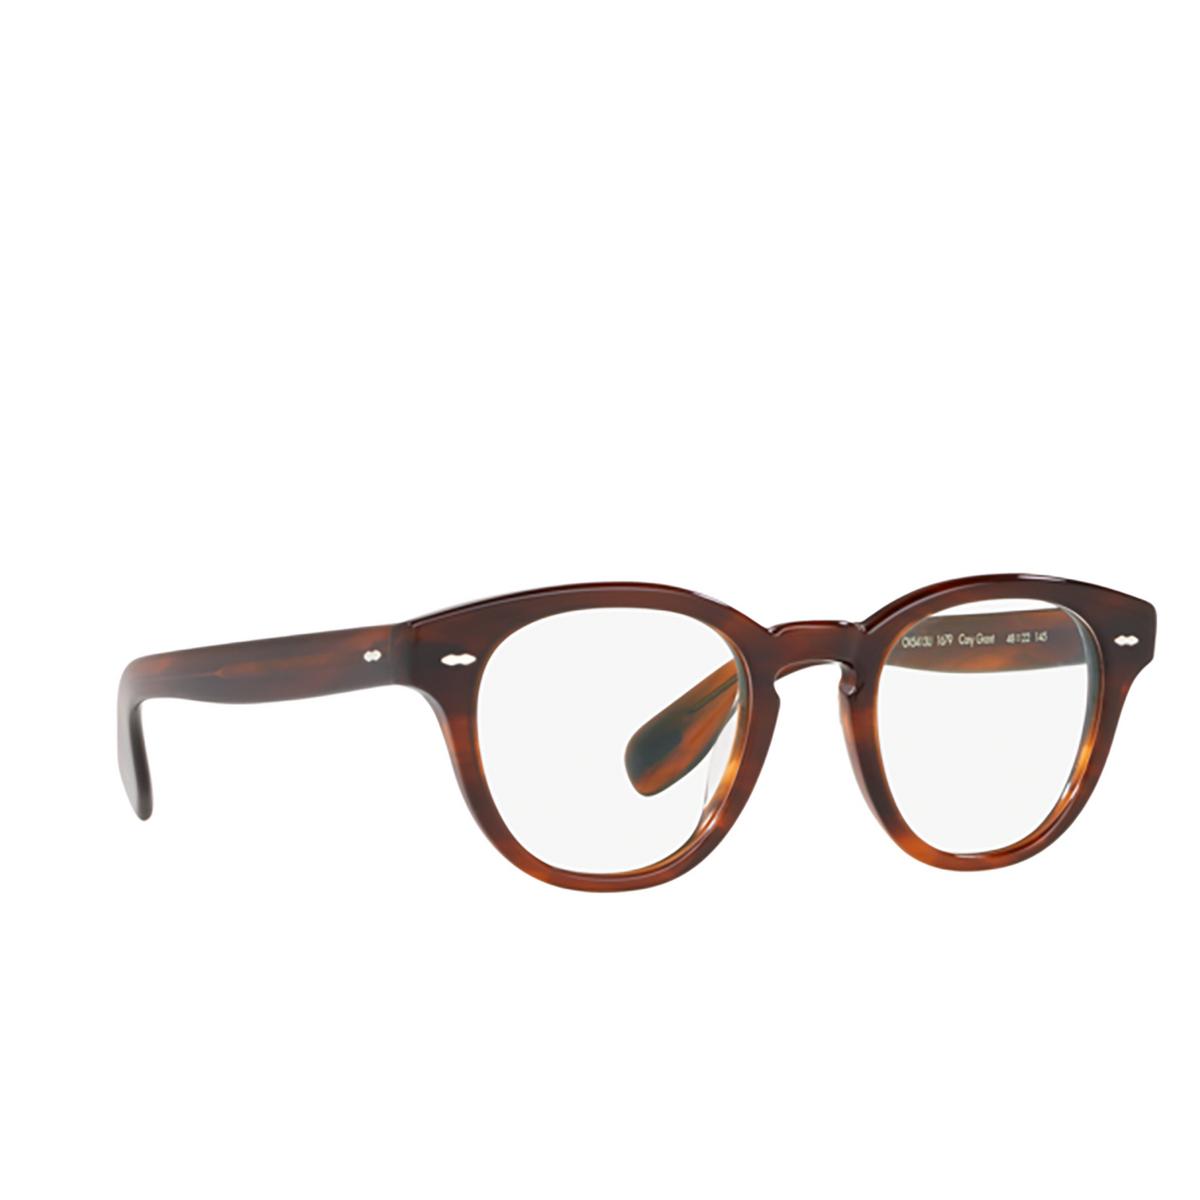 Oliver Peoples® Round Eyeglasses: Cary Grant OV5413U color Grant Tortoise 1679 - three-quarters view.